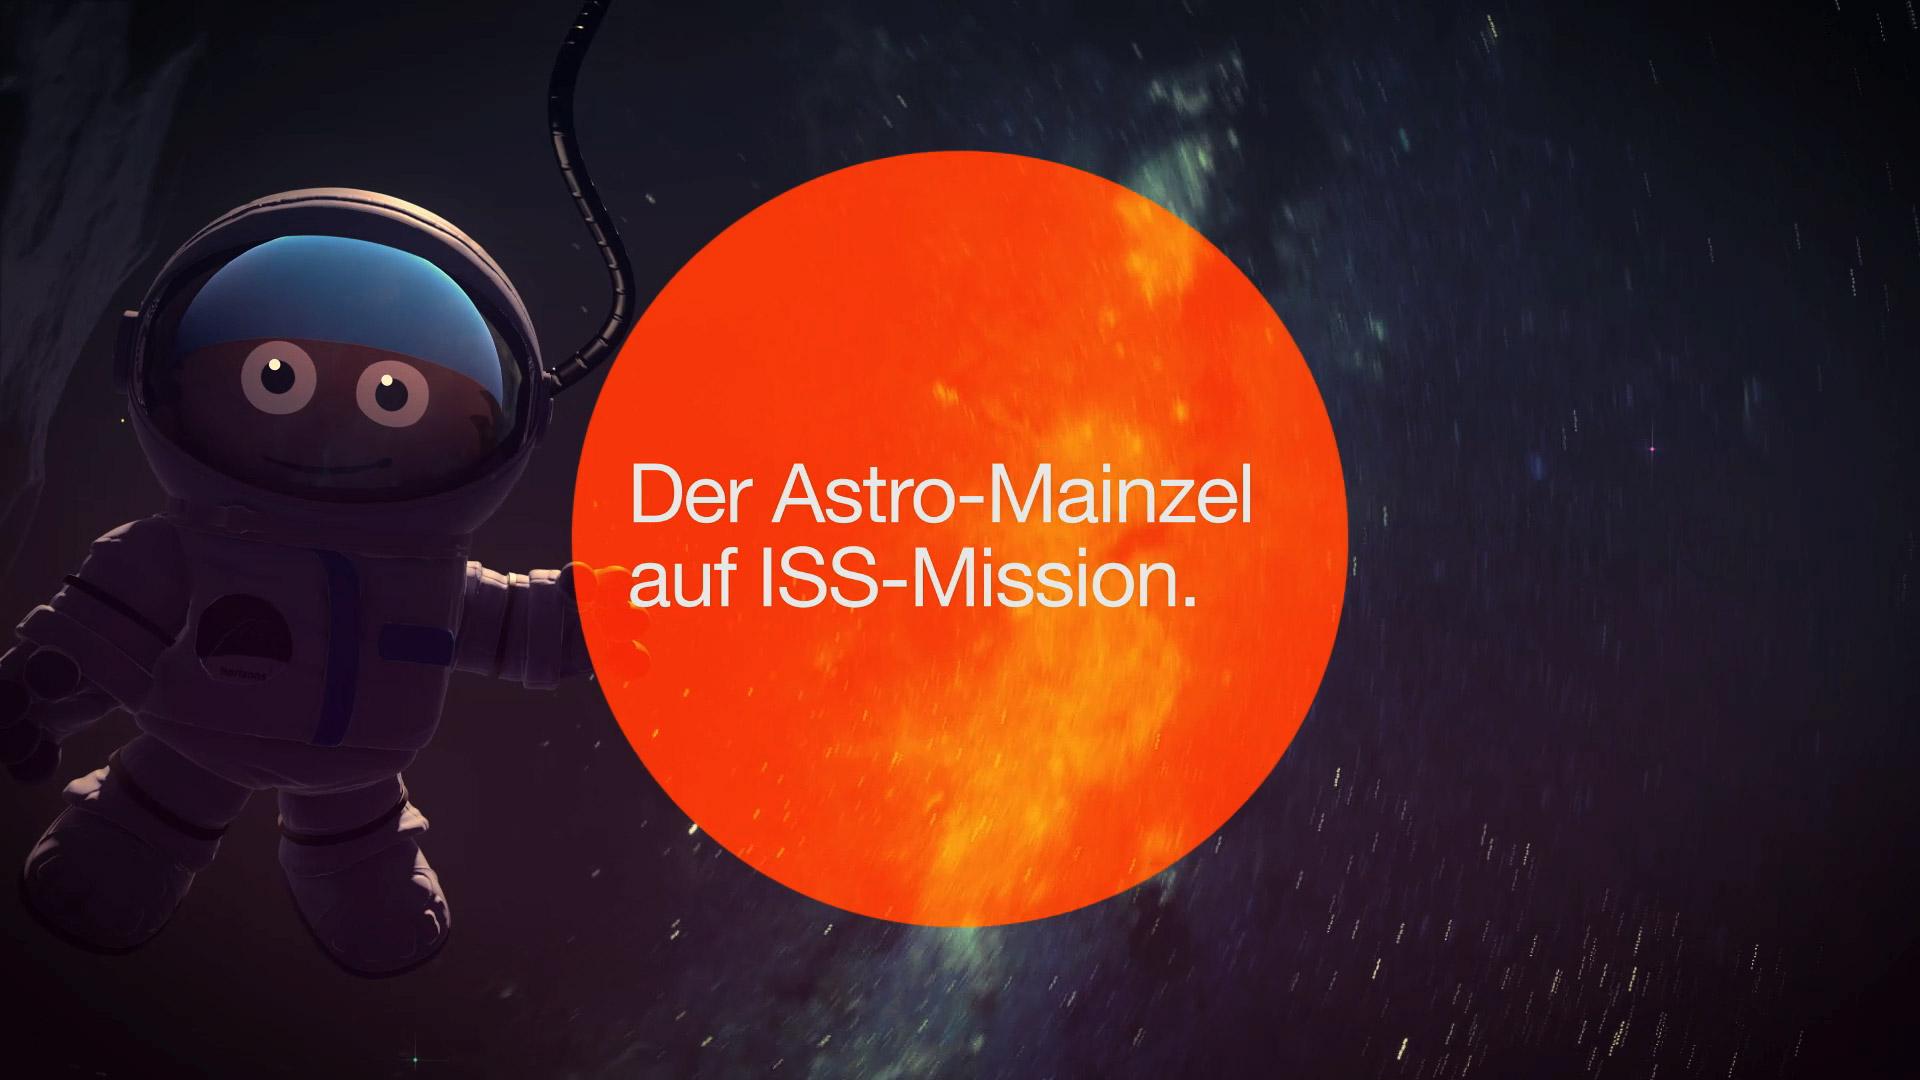 Astro-Mainzel